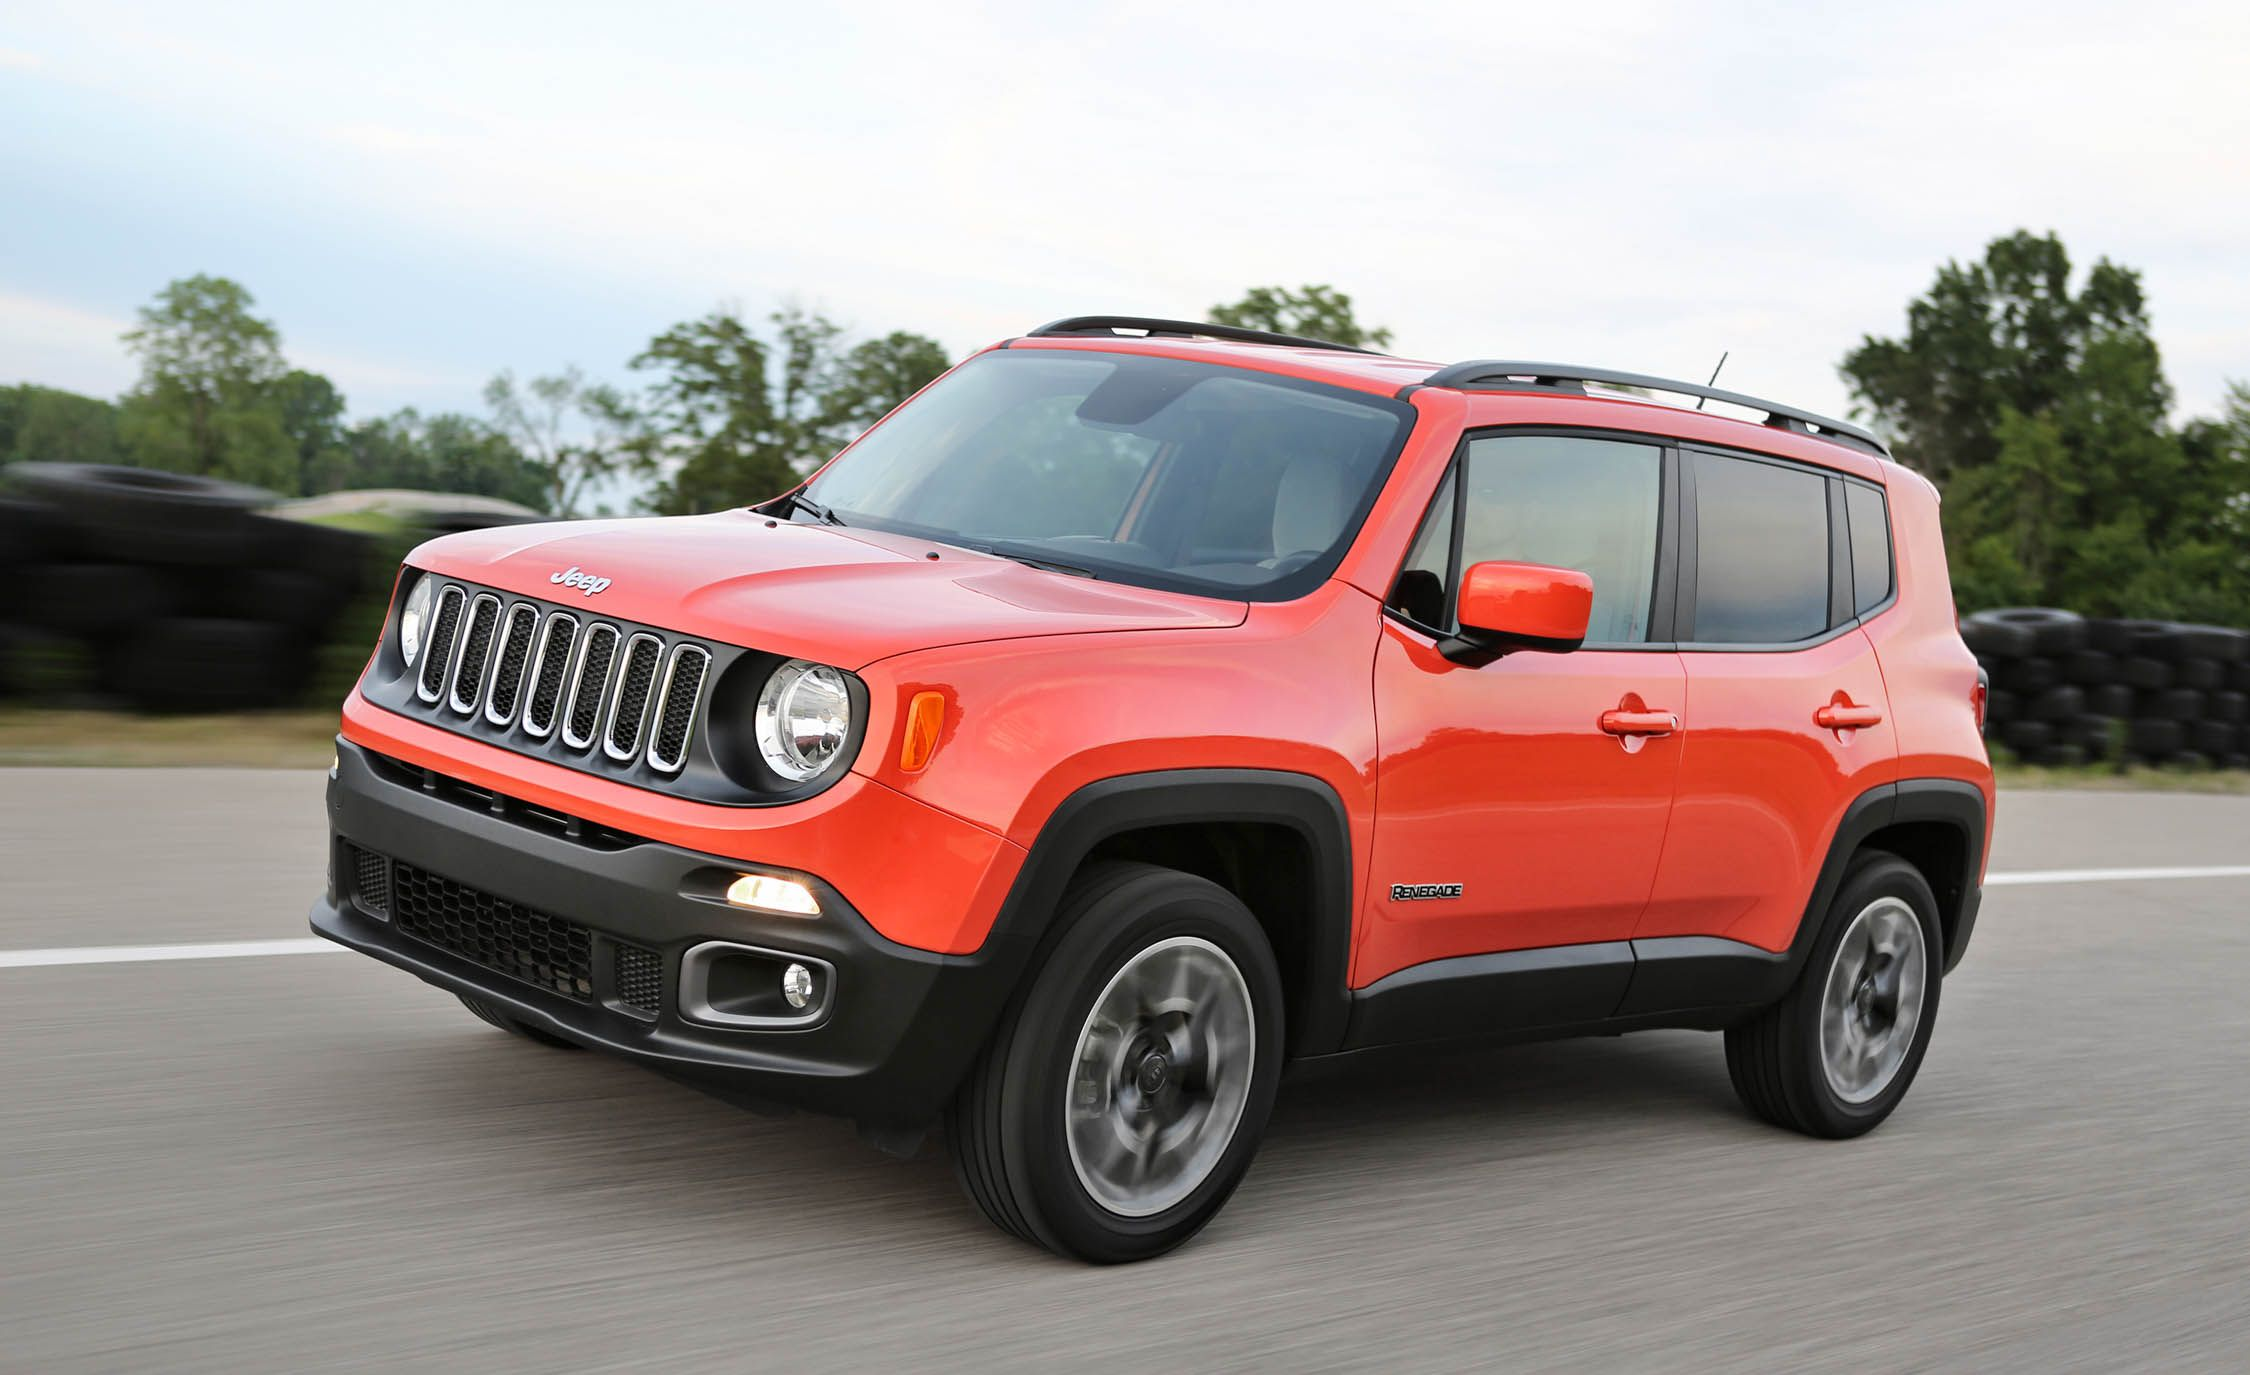 New Jeep Renegade >> Jeep Renegade Reviews Jeep Renegade Price Photos And Specs